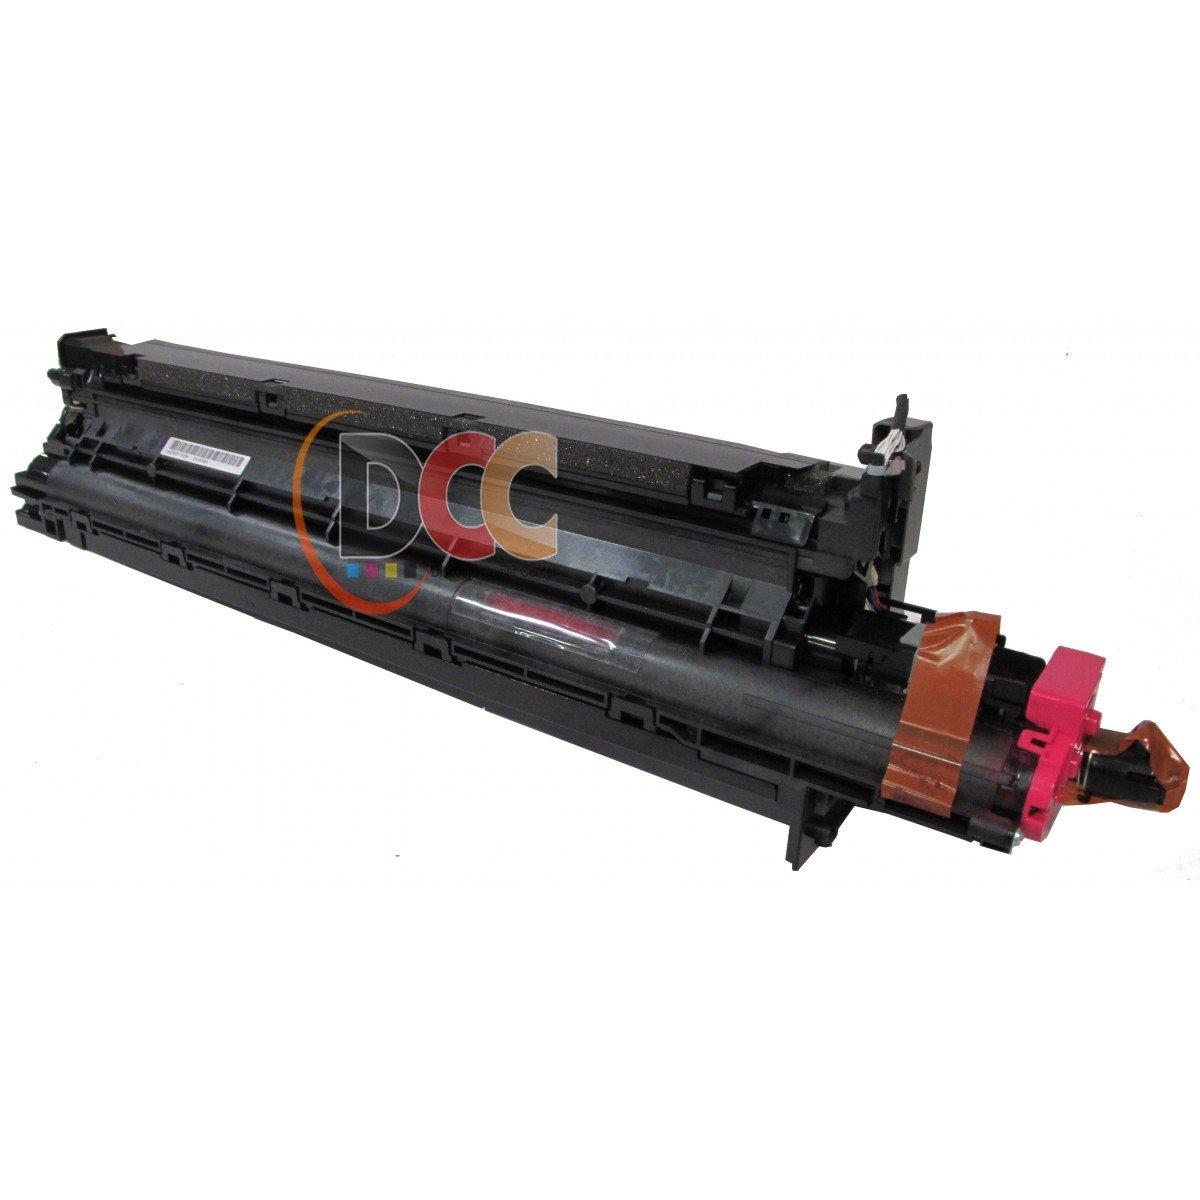 DV8705M Magenta Developer Unit For Taskalfa 6550ci 302K993093 by Kyocera